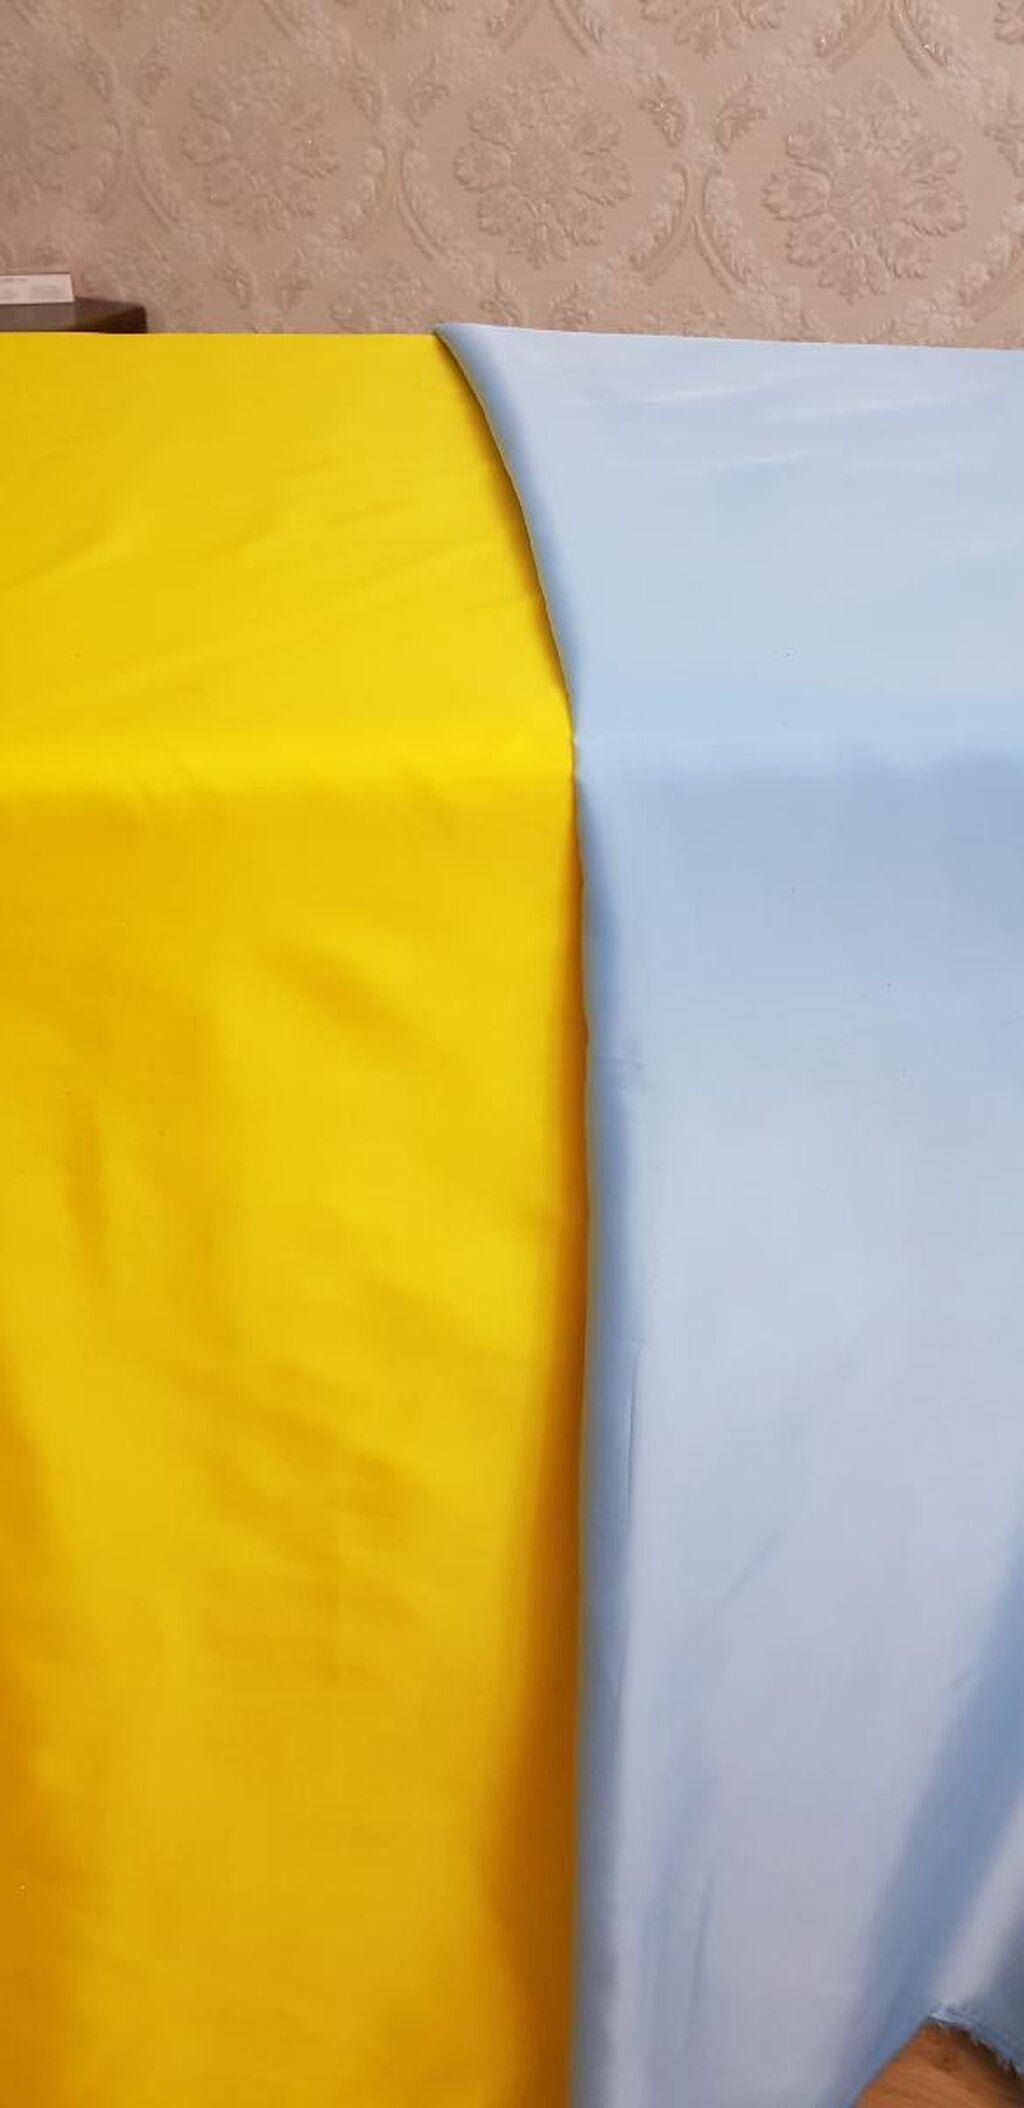 Ткани для декора. Продаю куски ткани От 1 метра до 30 метров. Сетка с: Ткани для декора. Продаю куски ткани От 1 метра до 30 метров. Сетка с